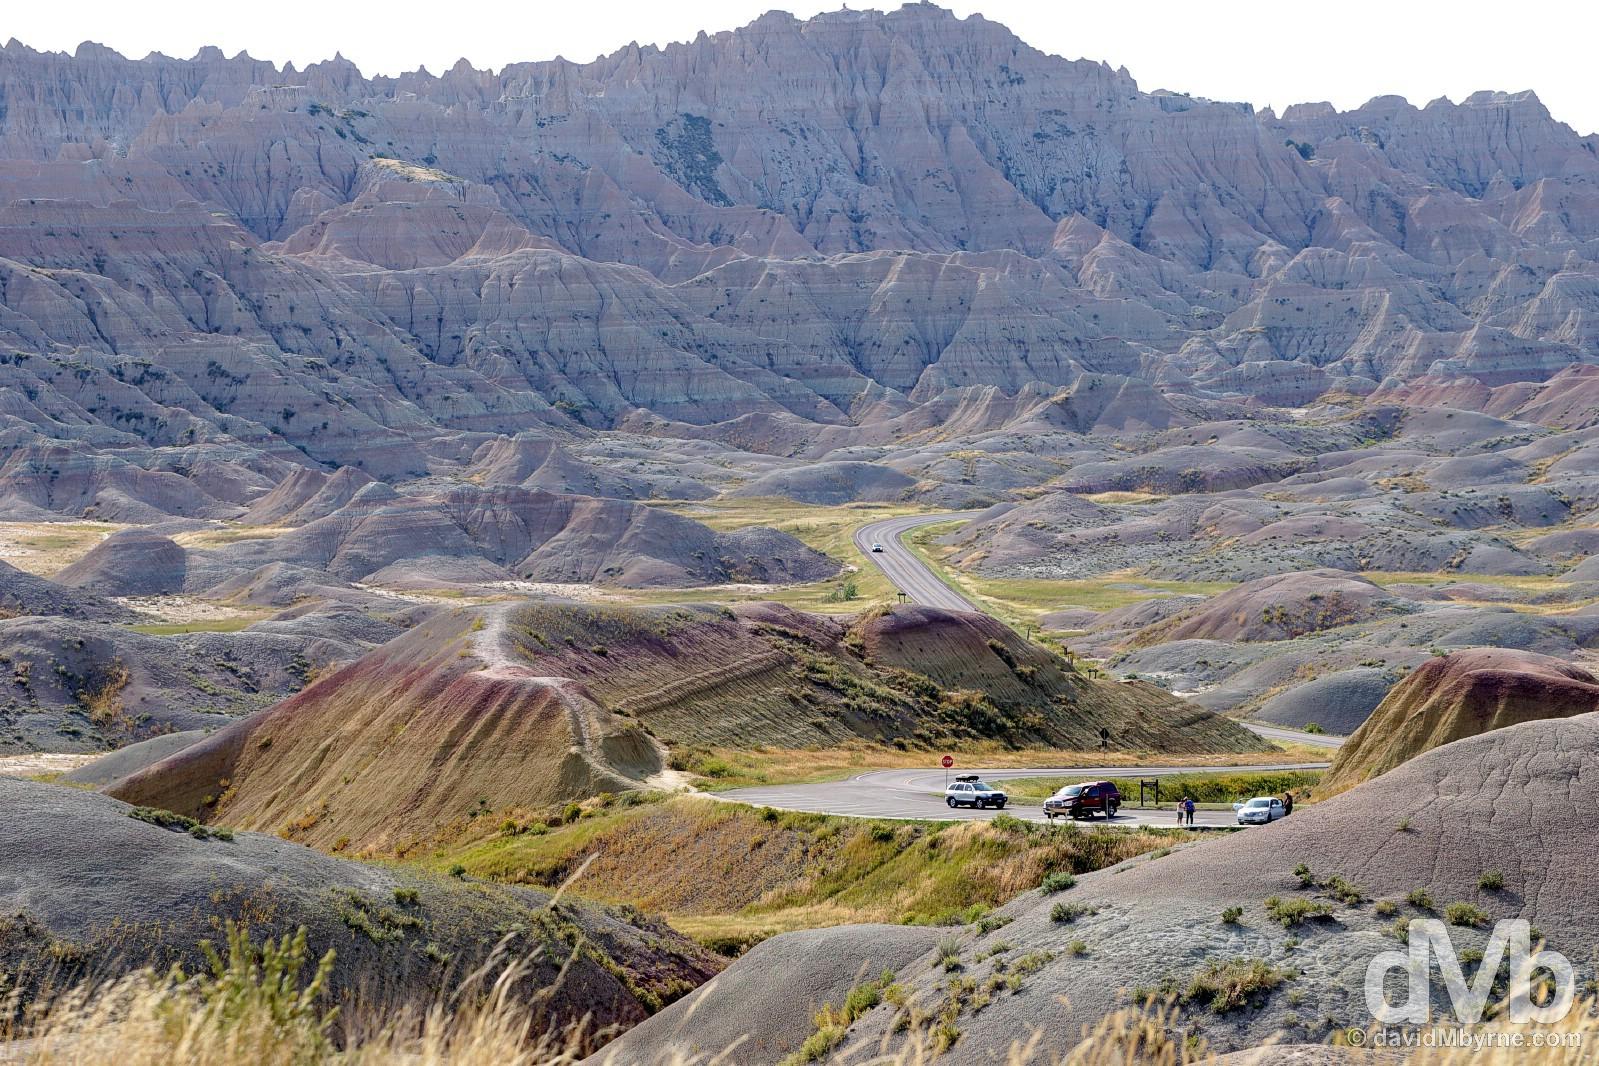 Badlands National Park, South Dakota, USA. September 1, 2016.